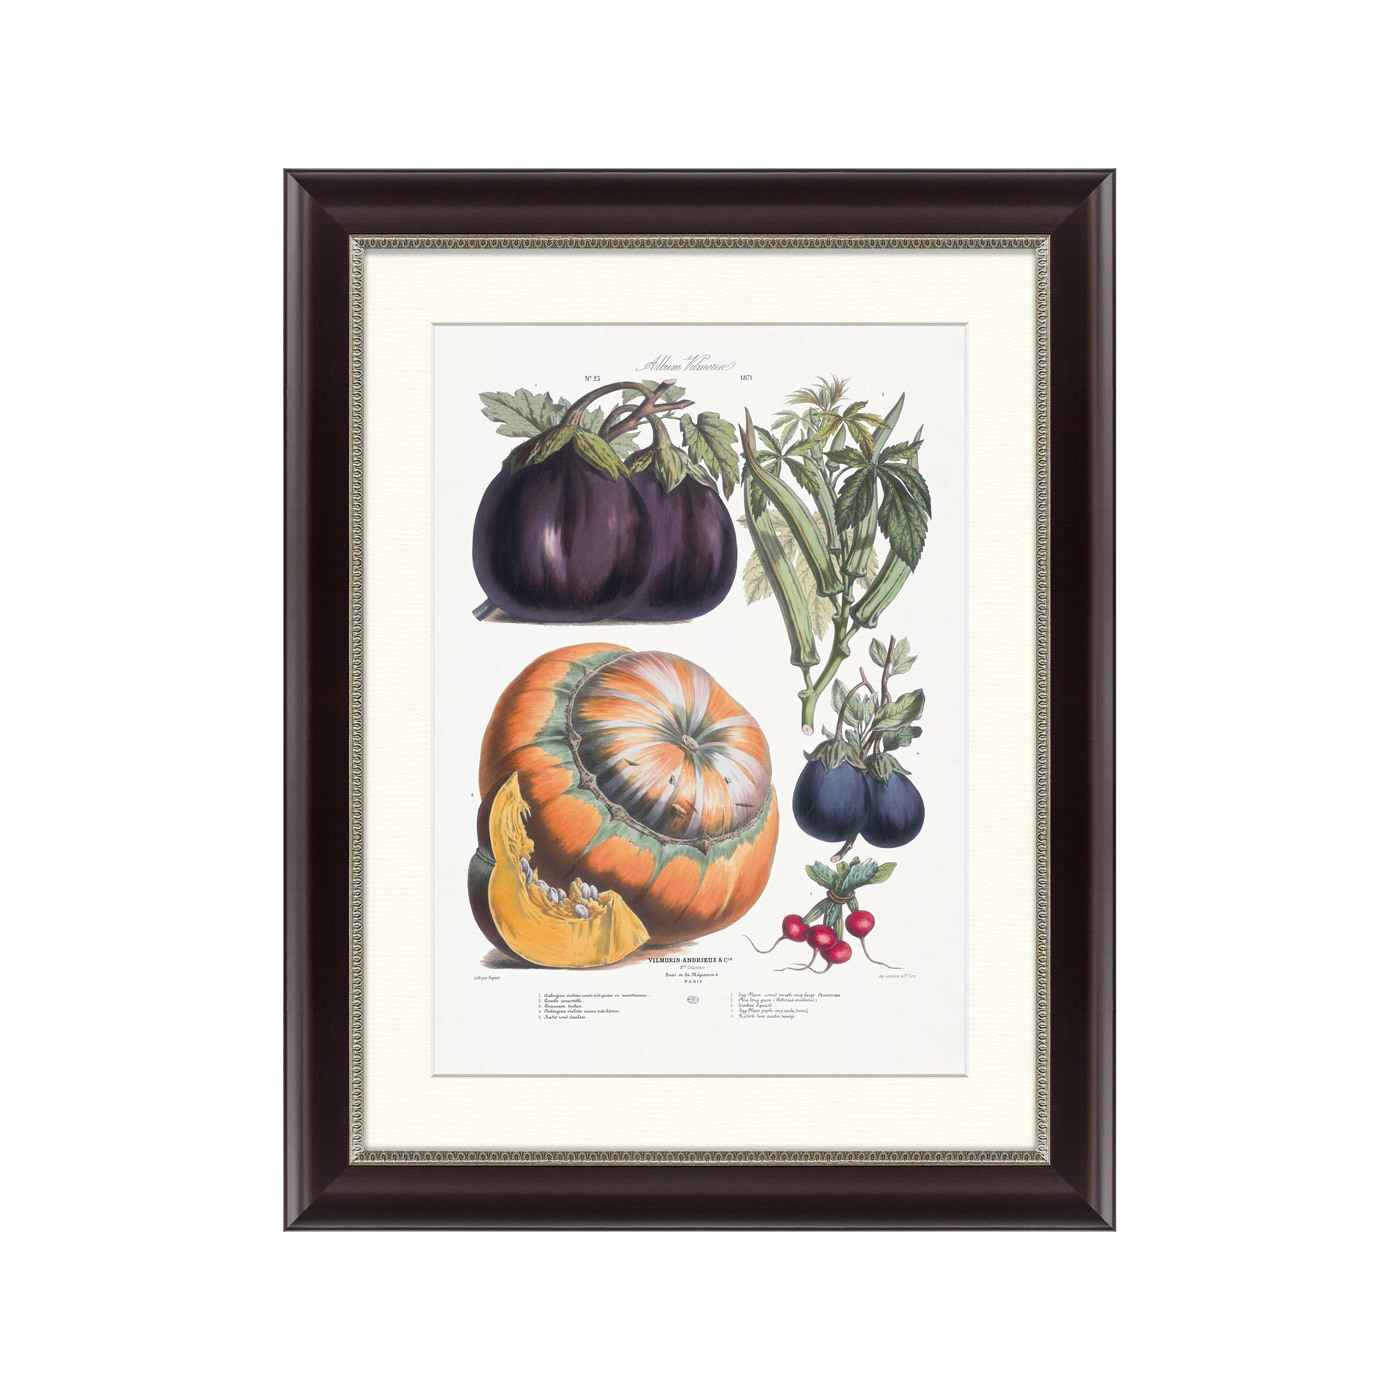 {} Картины в Квартиру Картина Vilmorin Andrieux & Cie, Альбом №23 (47х60 см) картины в квартиру картина спил 2 47х60 см